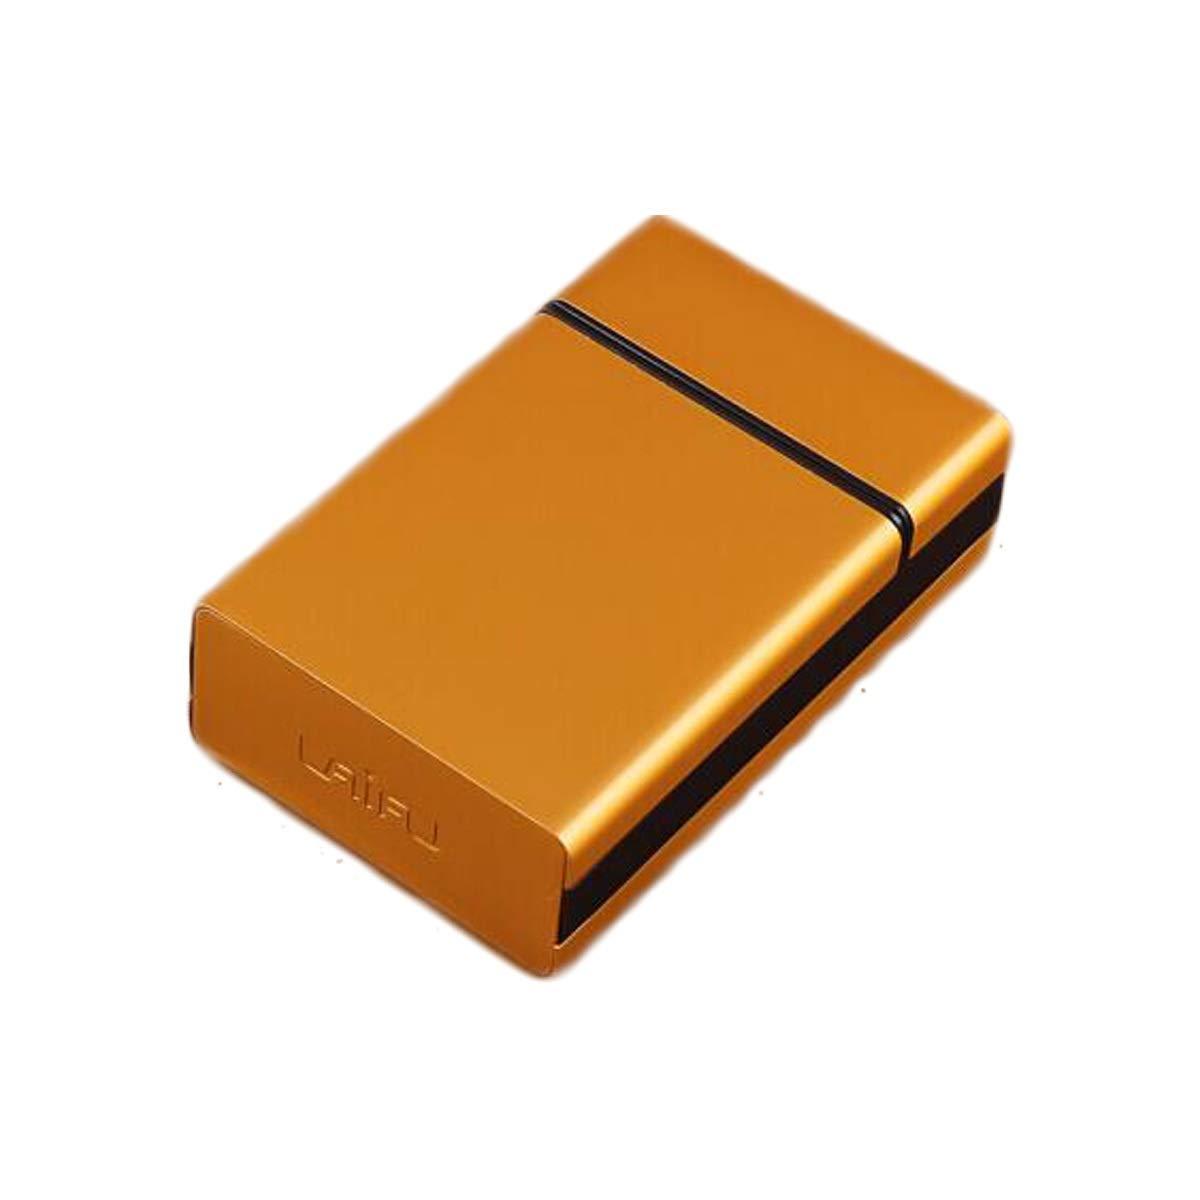 WENPINHUI Cigarette Case, Soft Pack Cigarette Case 20 Sticks Metal Portable Flip Cover Slim Creative Personality Authentic Men's Smoking Set (Color : Gold) by WENPINHUI